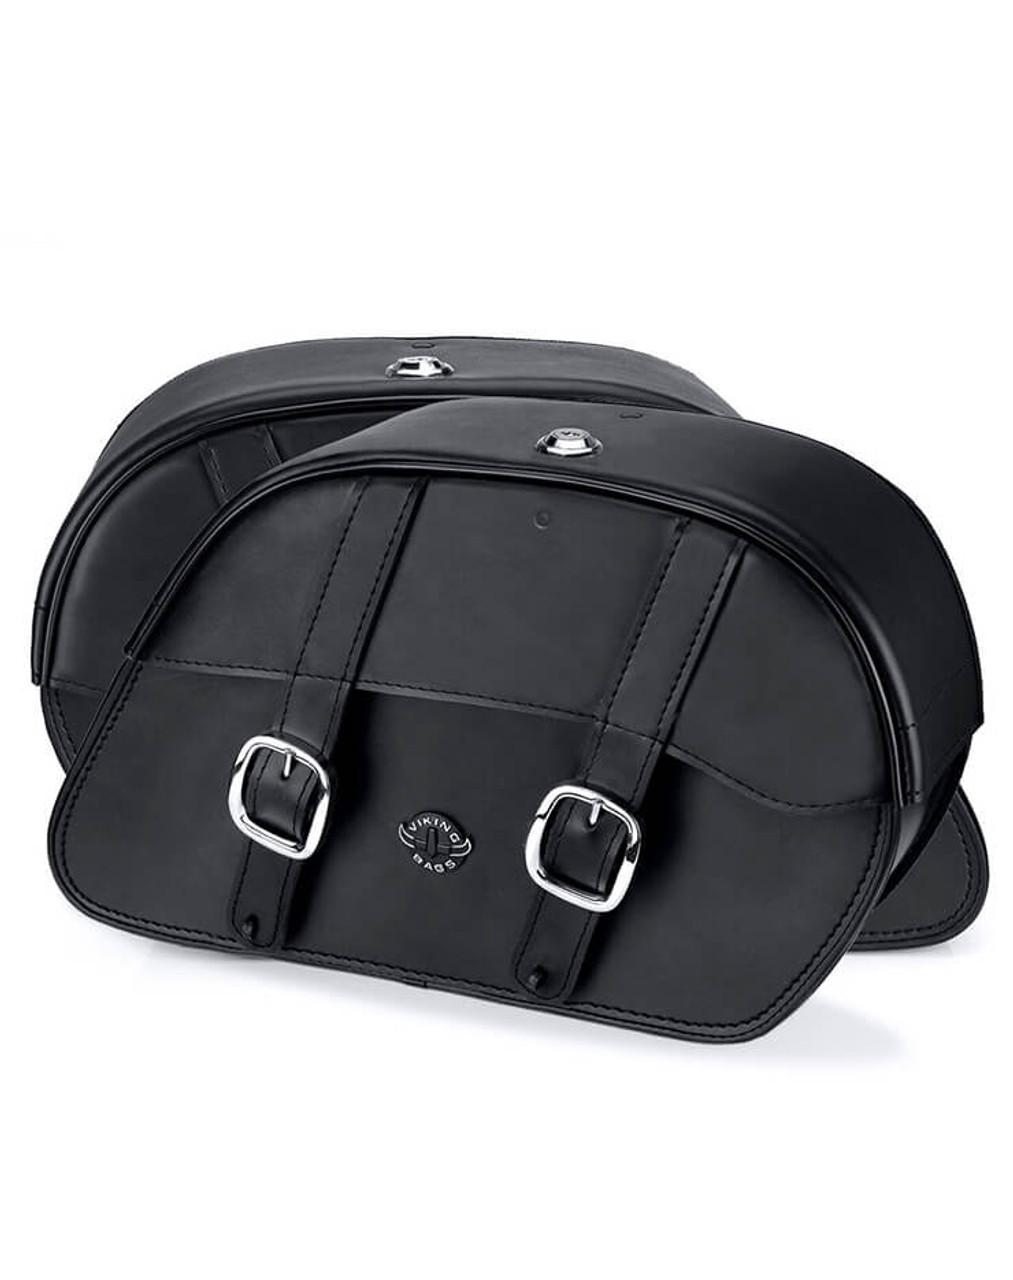 VikingBags Skarner Large Double Strap Suzuki Intruder 1500 VL1500 Leather Motorcycle Saddlebags Both Bags View